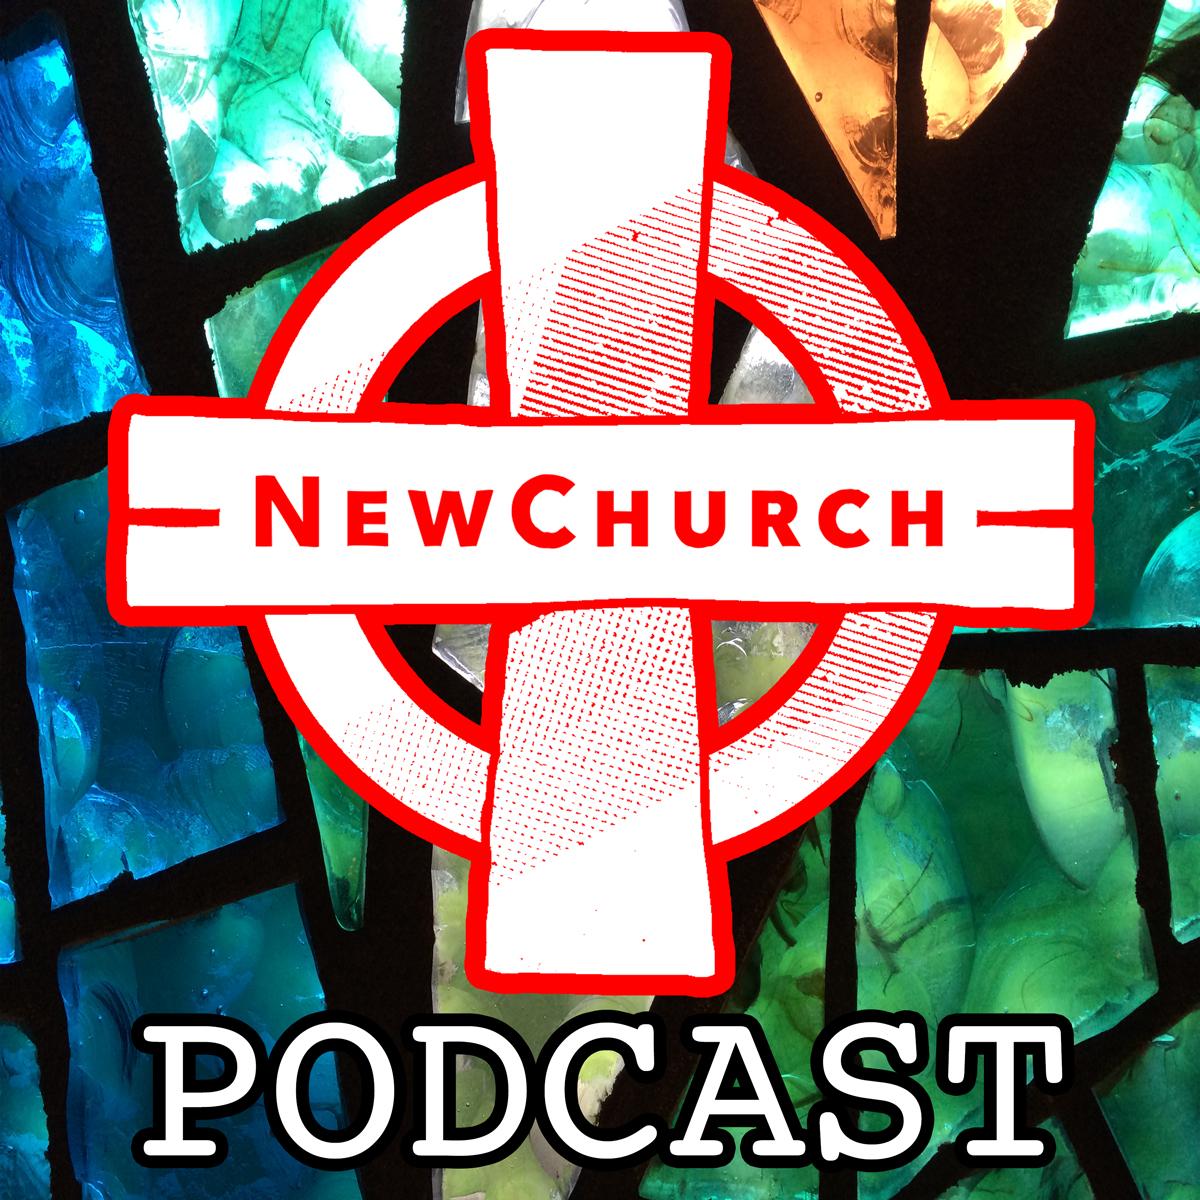 NewChurch Podcast show art